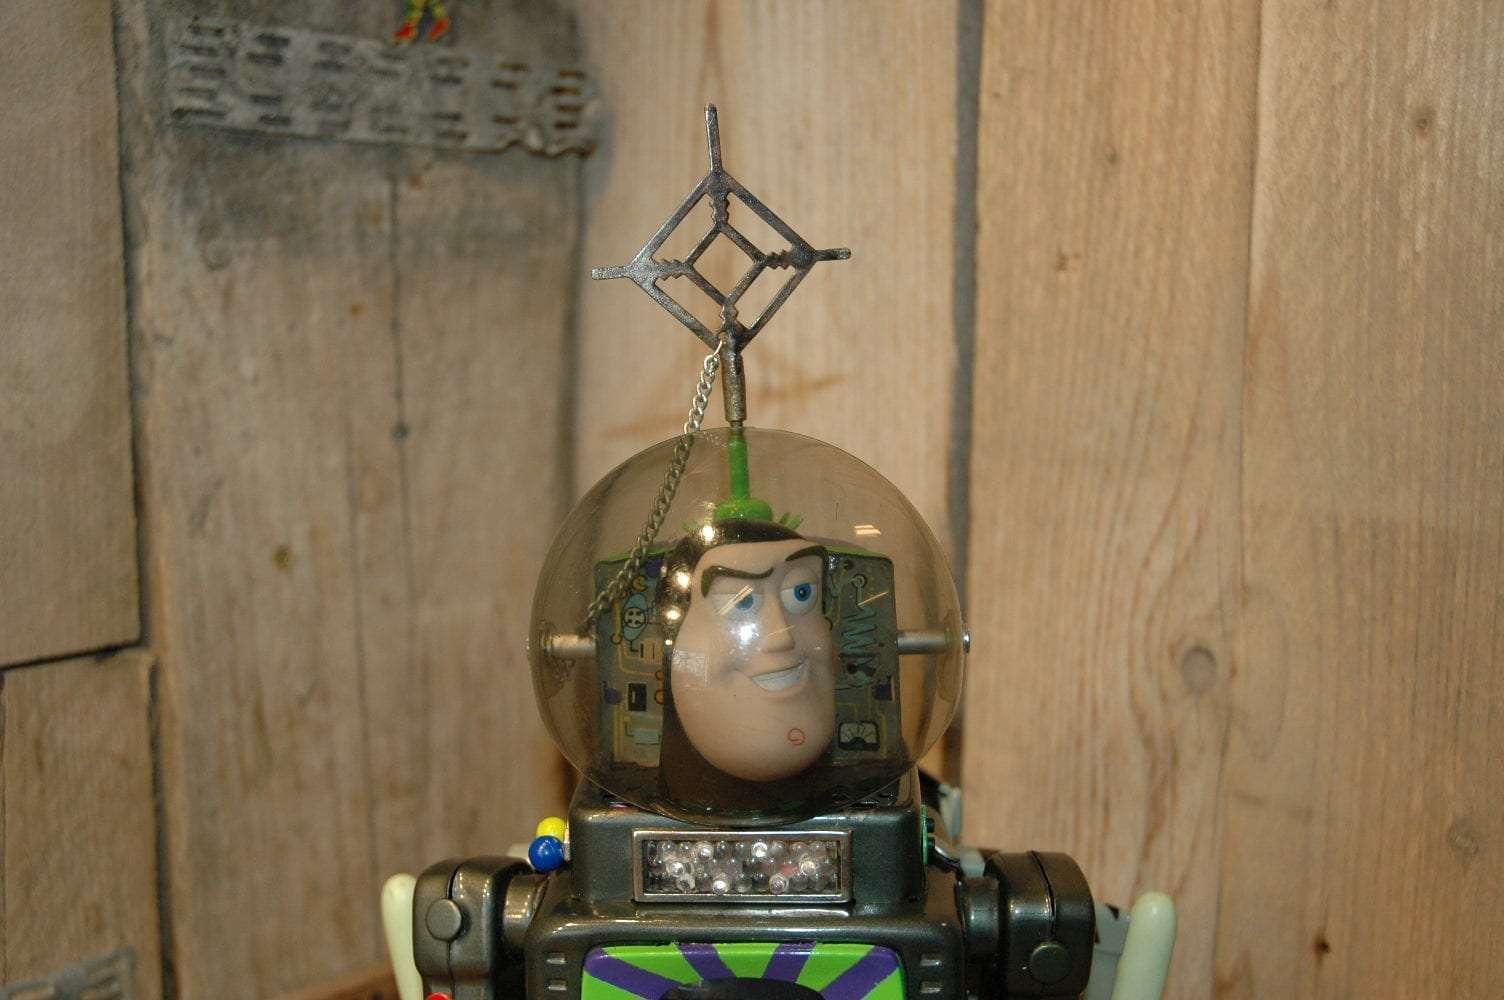 VST- Television Buzz Lightyear II - Vintage Spacetoys